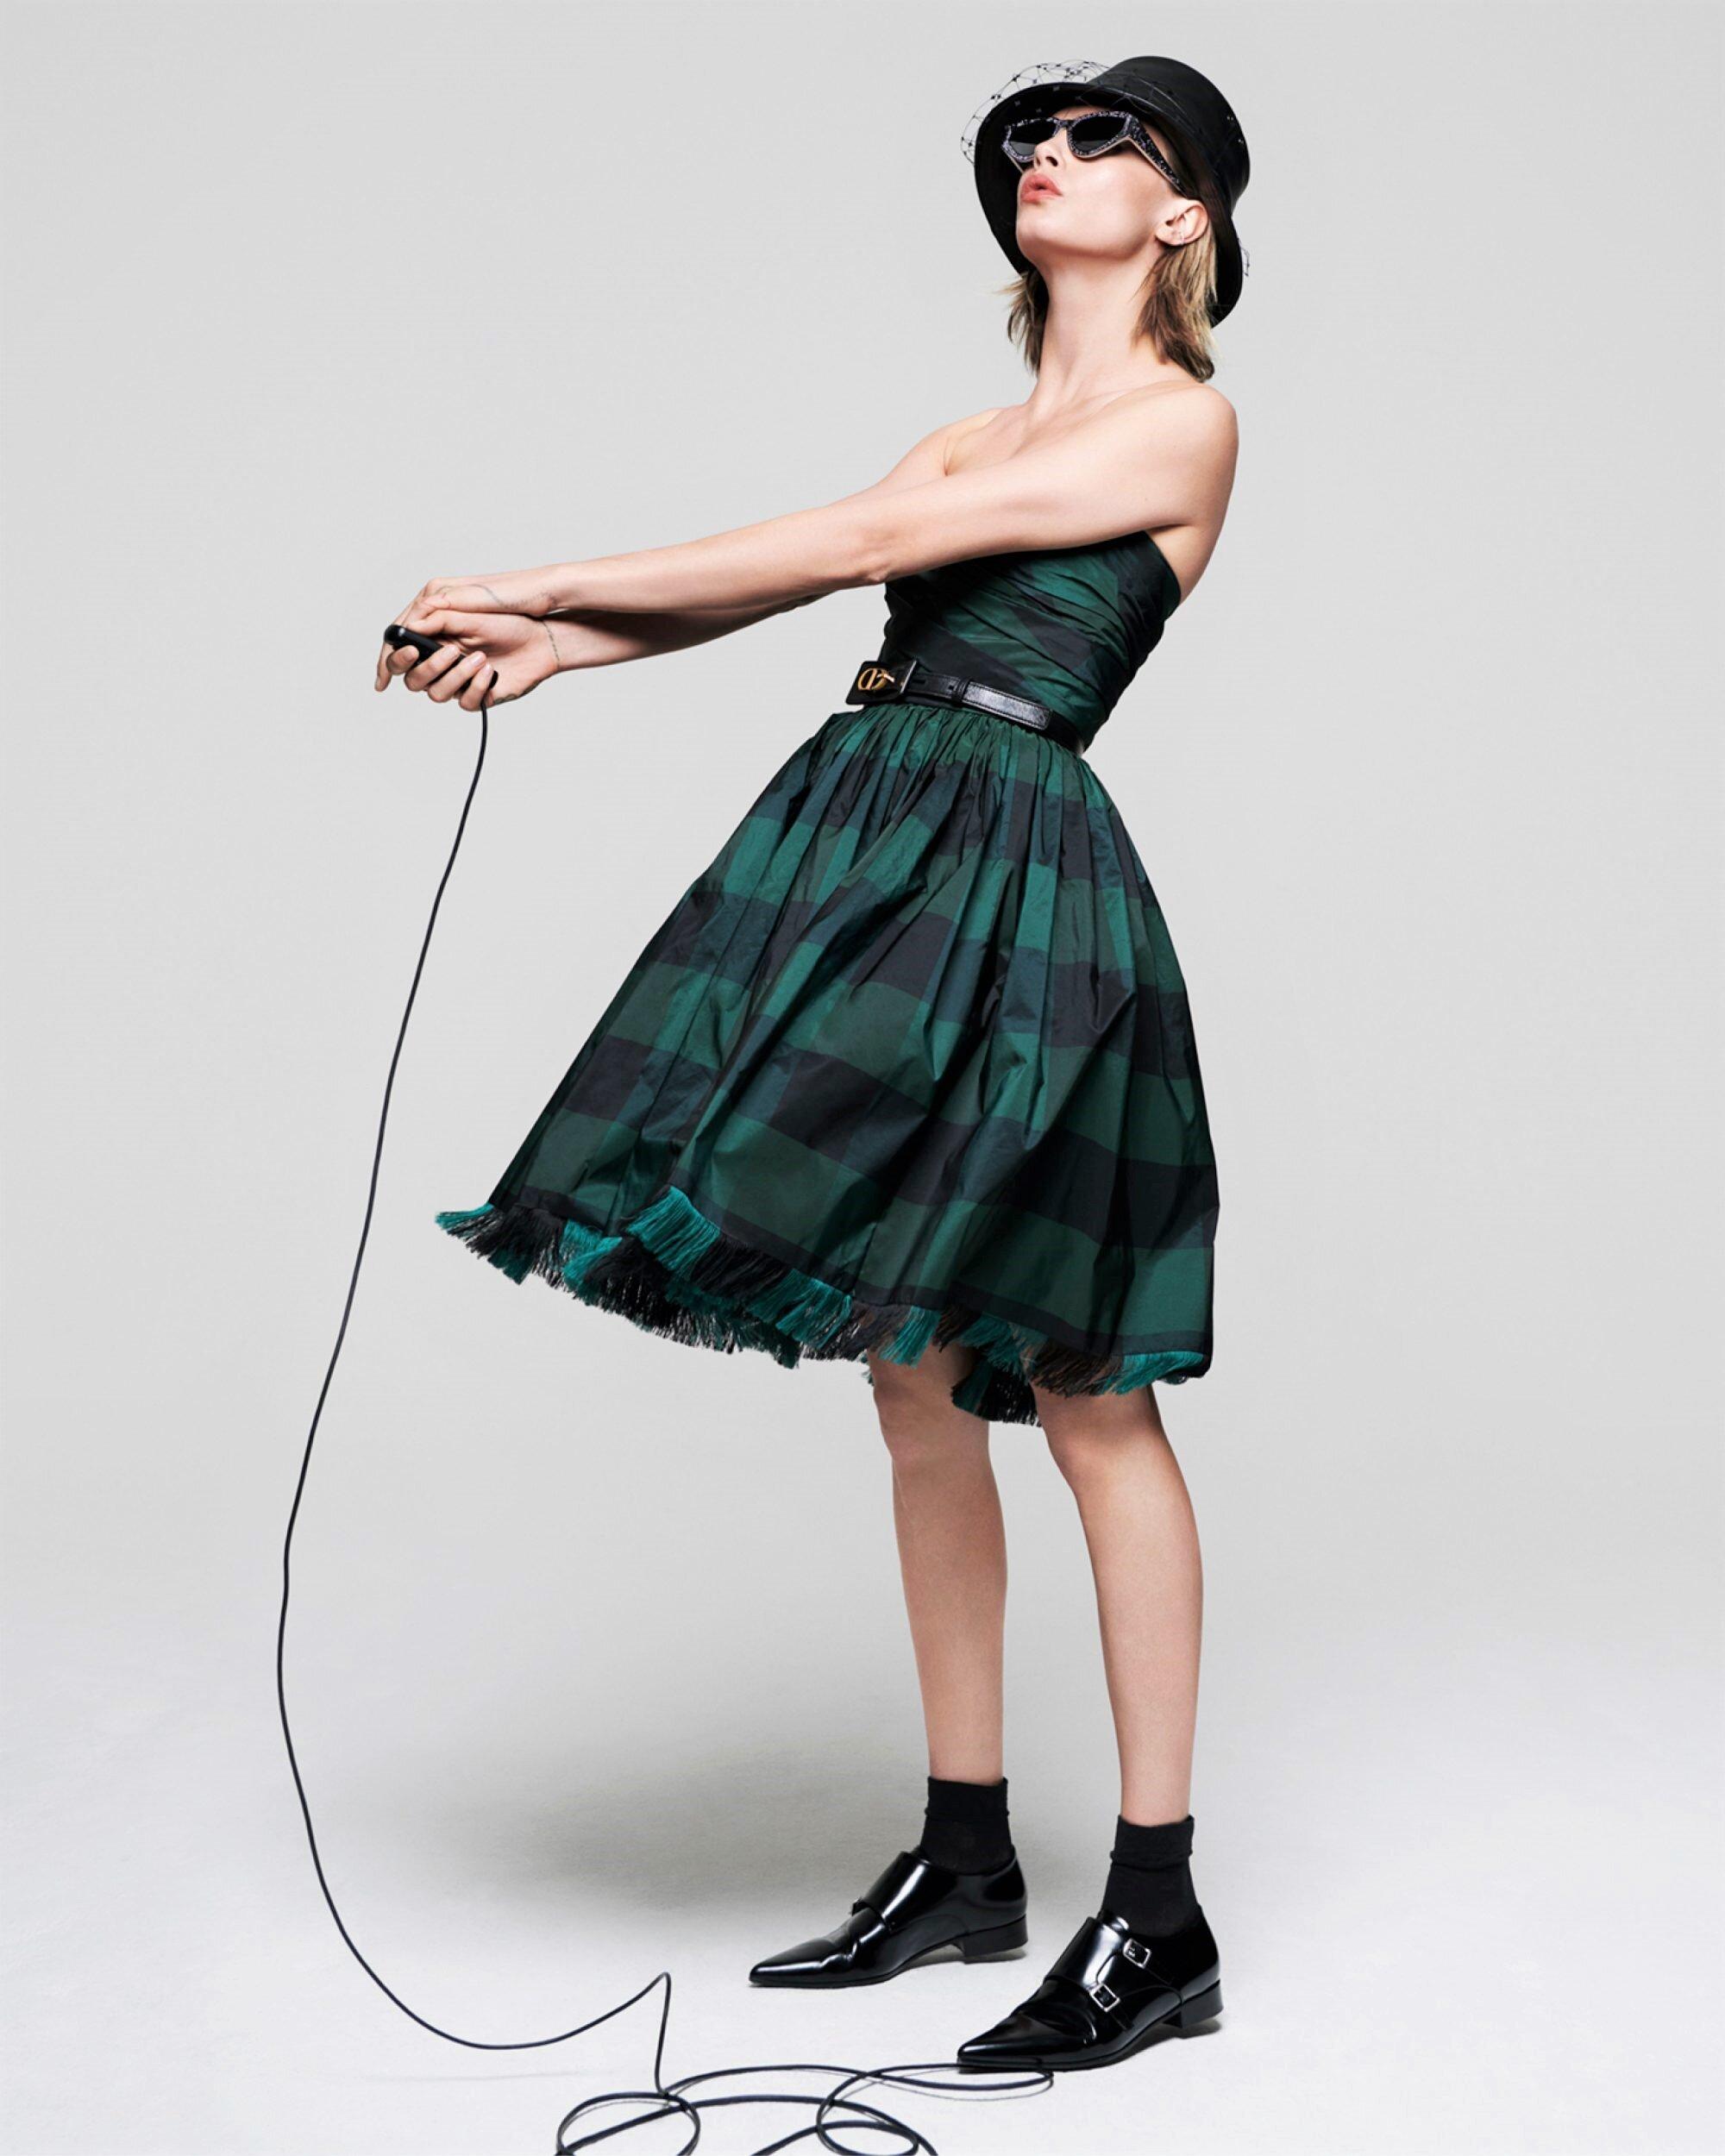 Cara Delevingne-Dior-V Magazine  (3).jpg